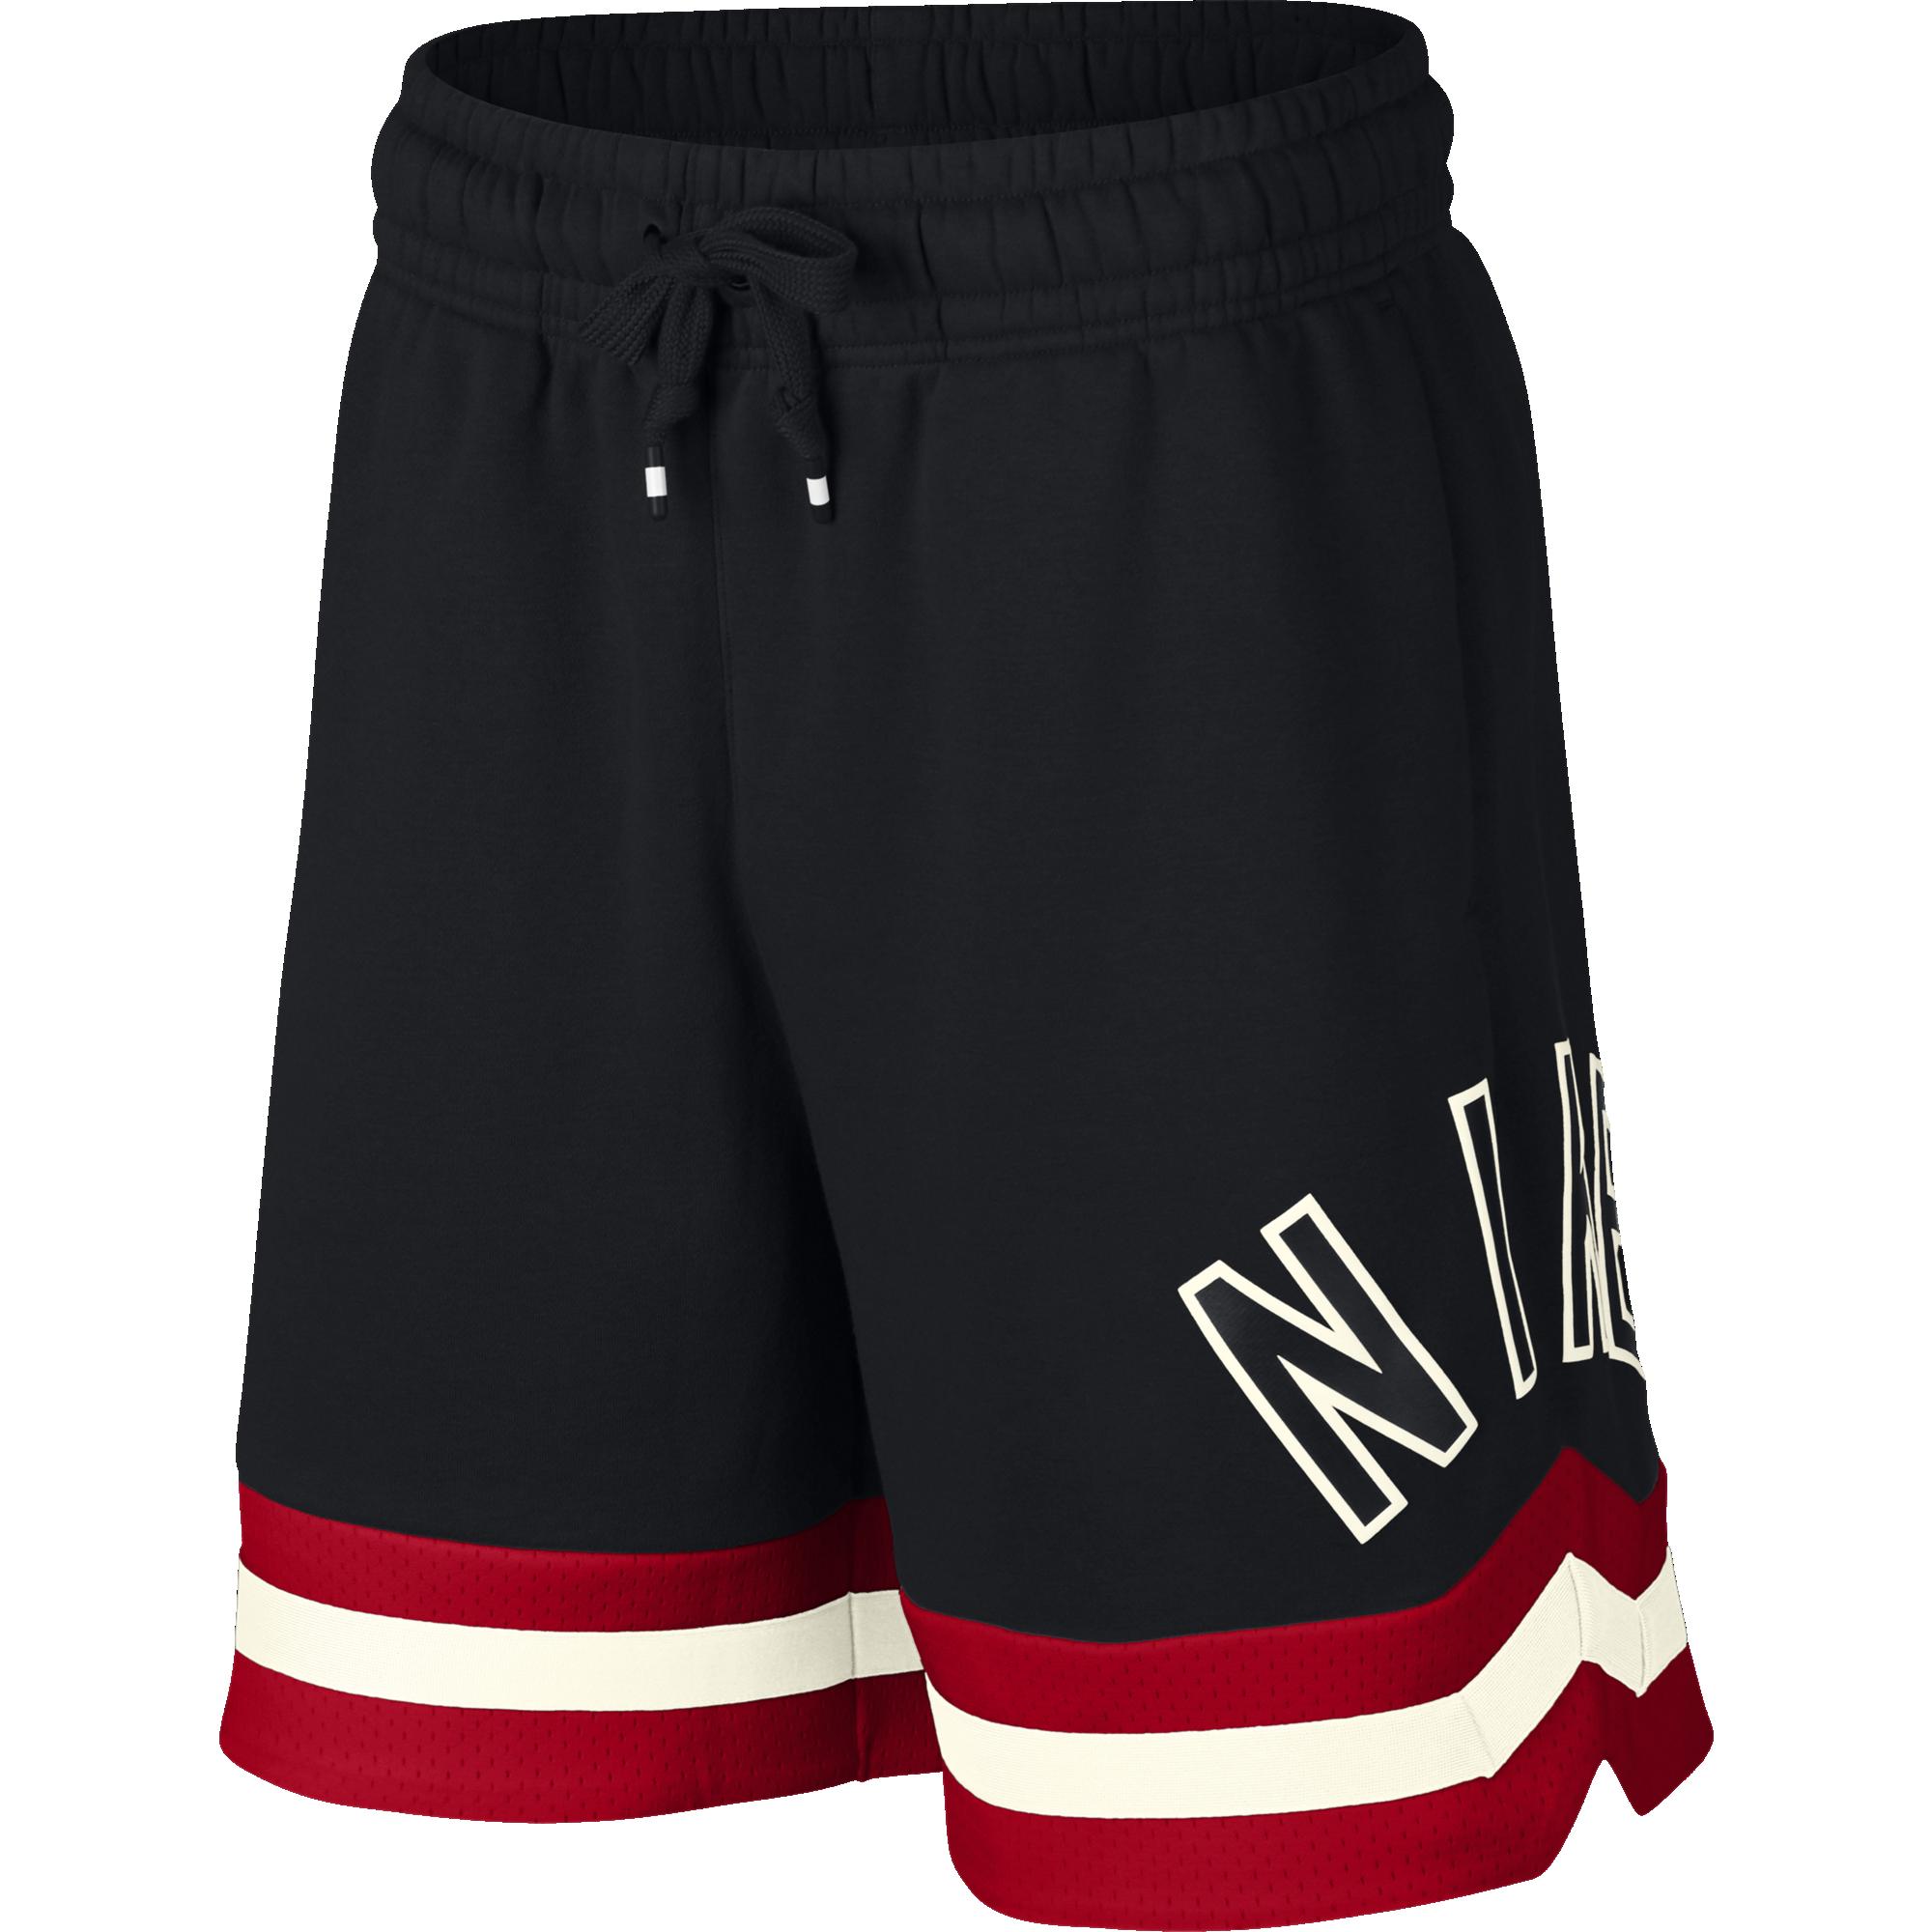 e75403aca226 Nike Air Fleece Shorts - Black University Red-Sail